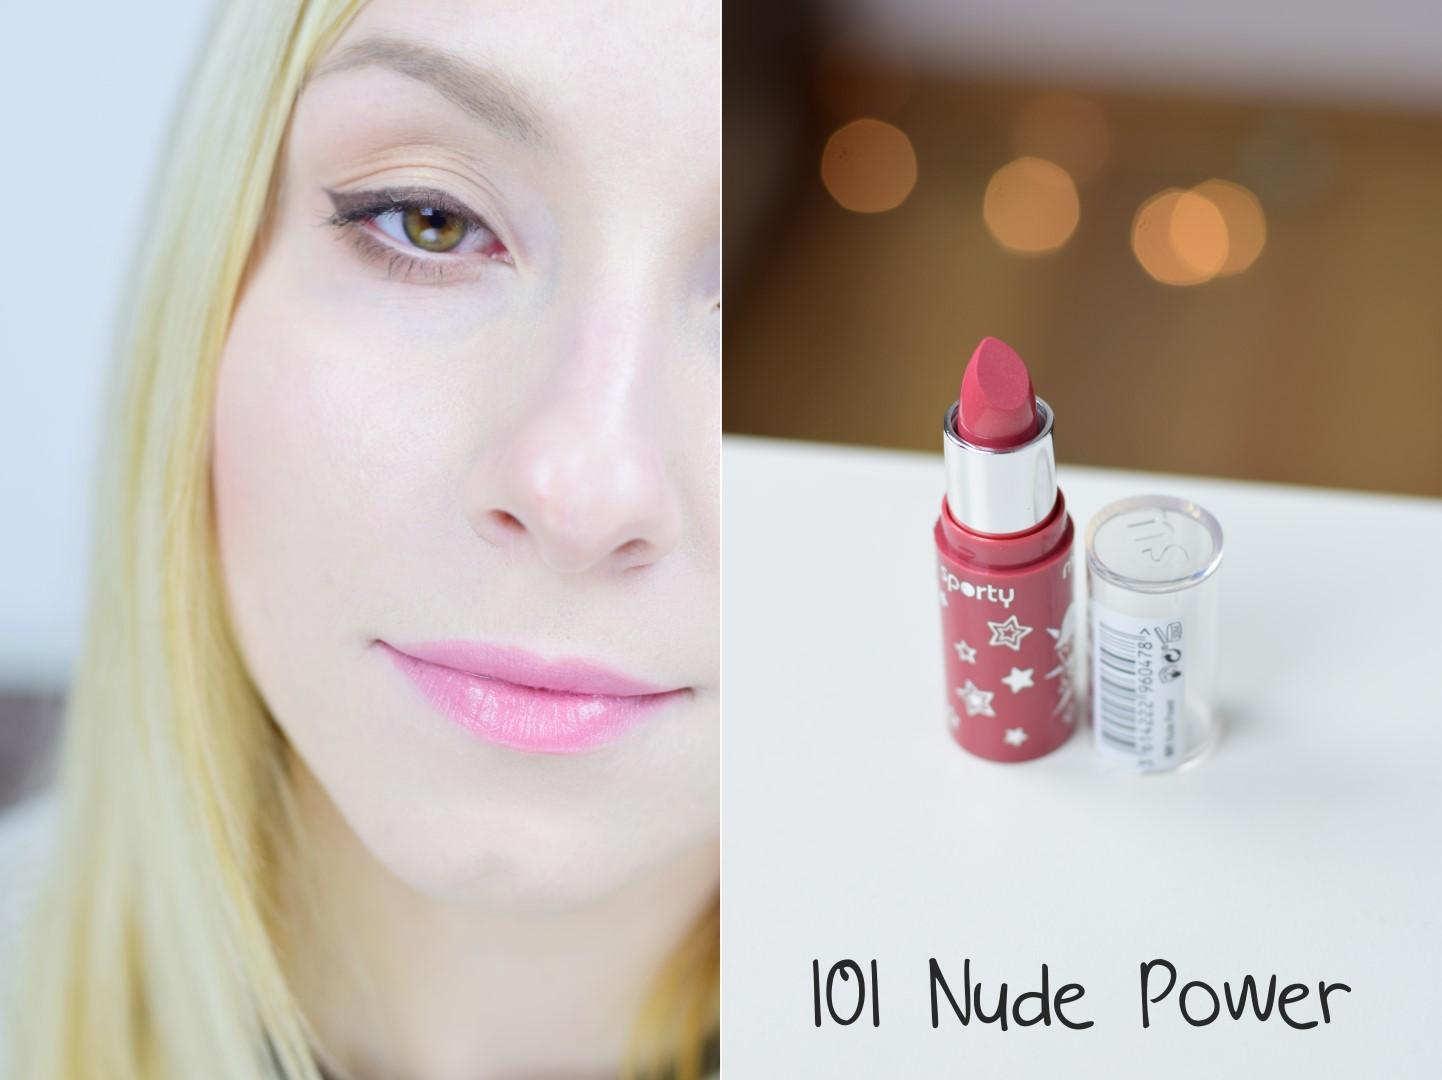 miss_sporty_wonder_smooth_blog_opinia_recenzja_swatche_nude_power_100